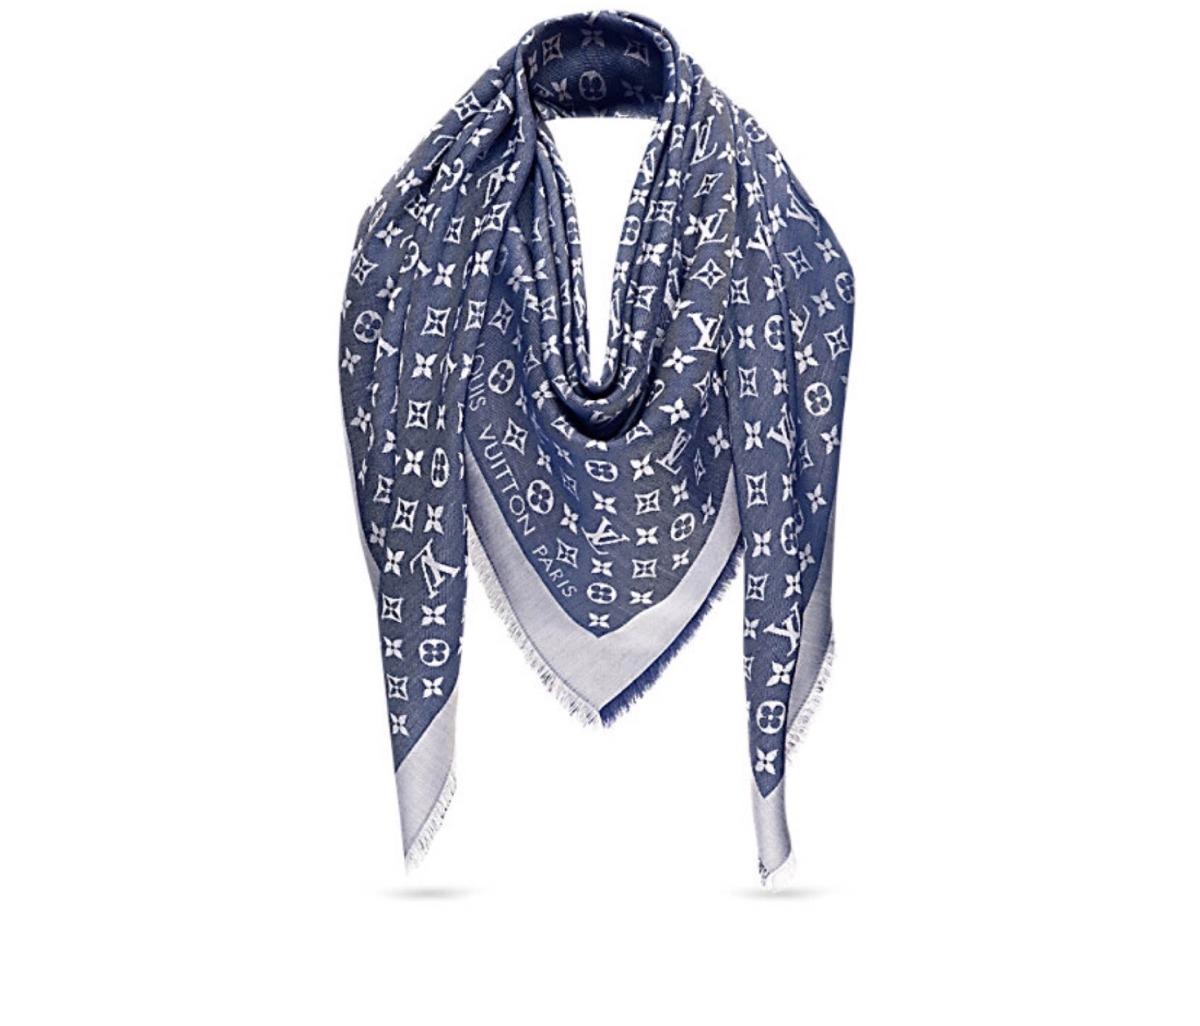 Echarpe pashmina Louis Vuitton Xale Monogram Denim - R  249,00 em ... 88bfae80aae